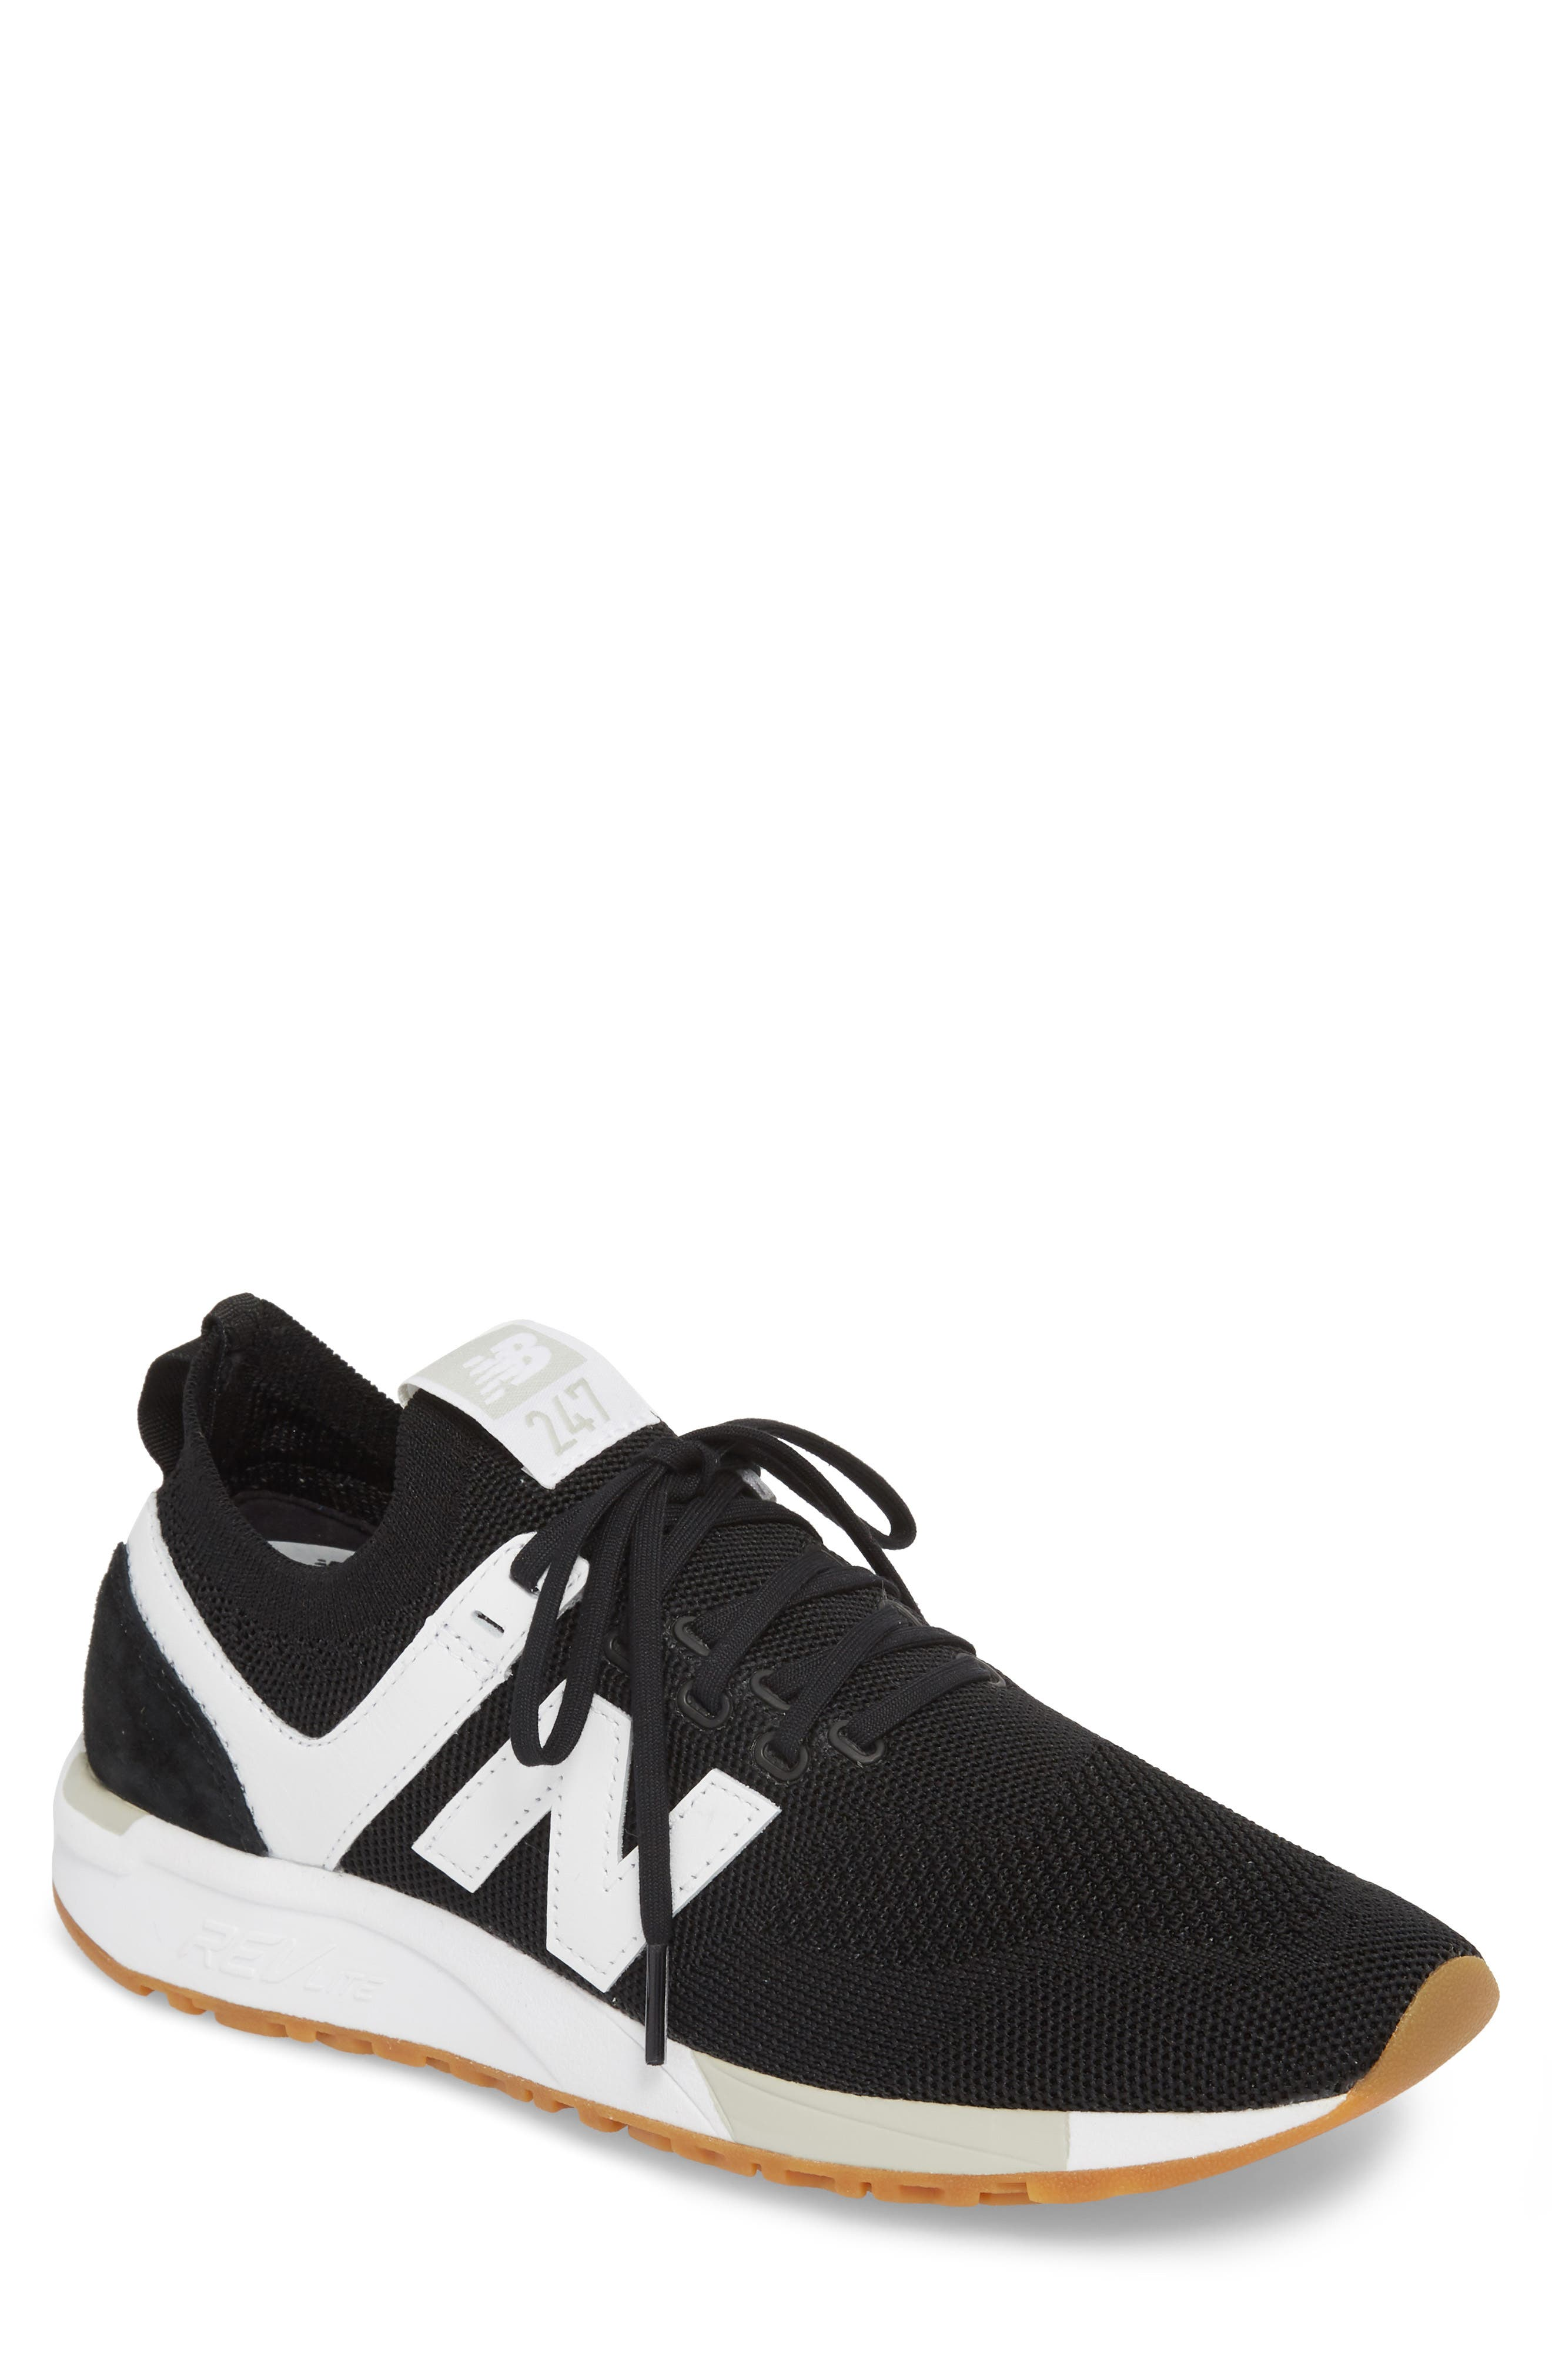 247 Decon Sneaker,                             Main thumbnail 1, color,                             001